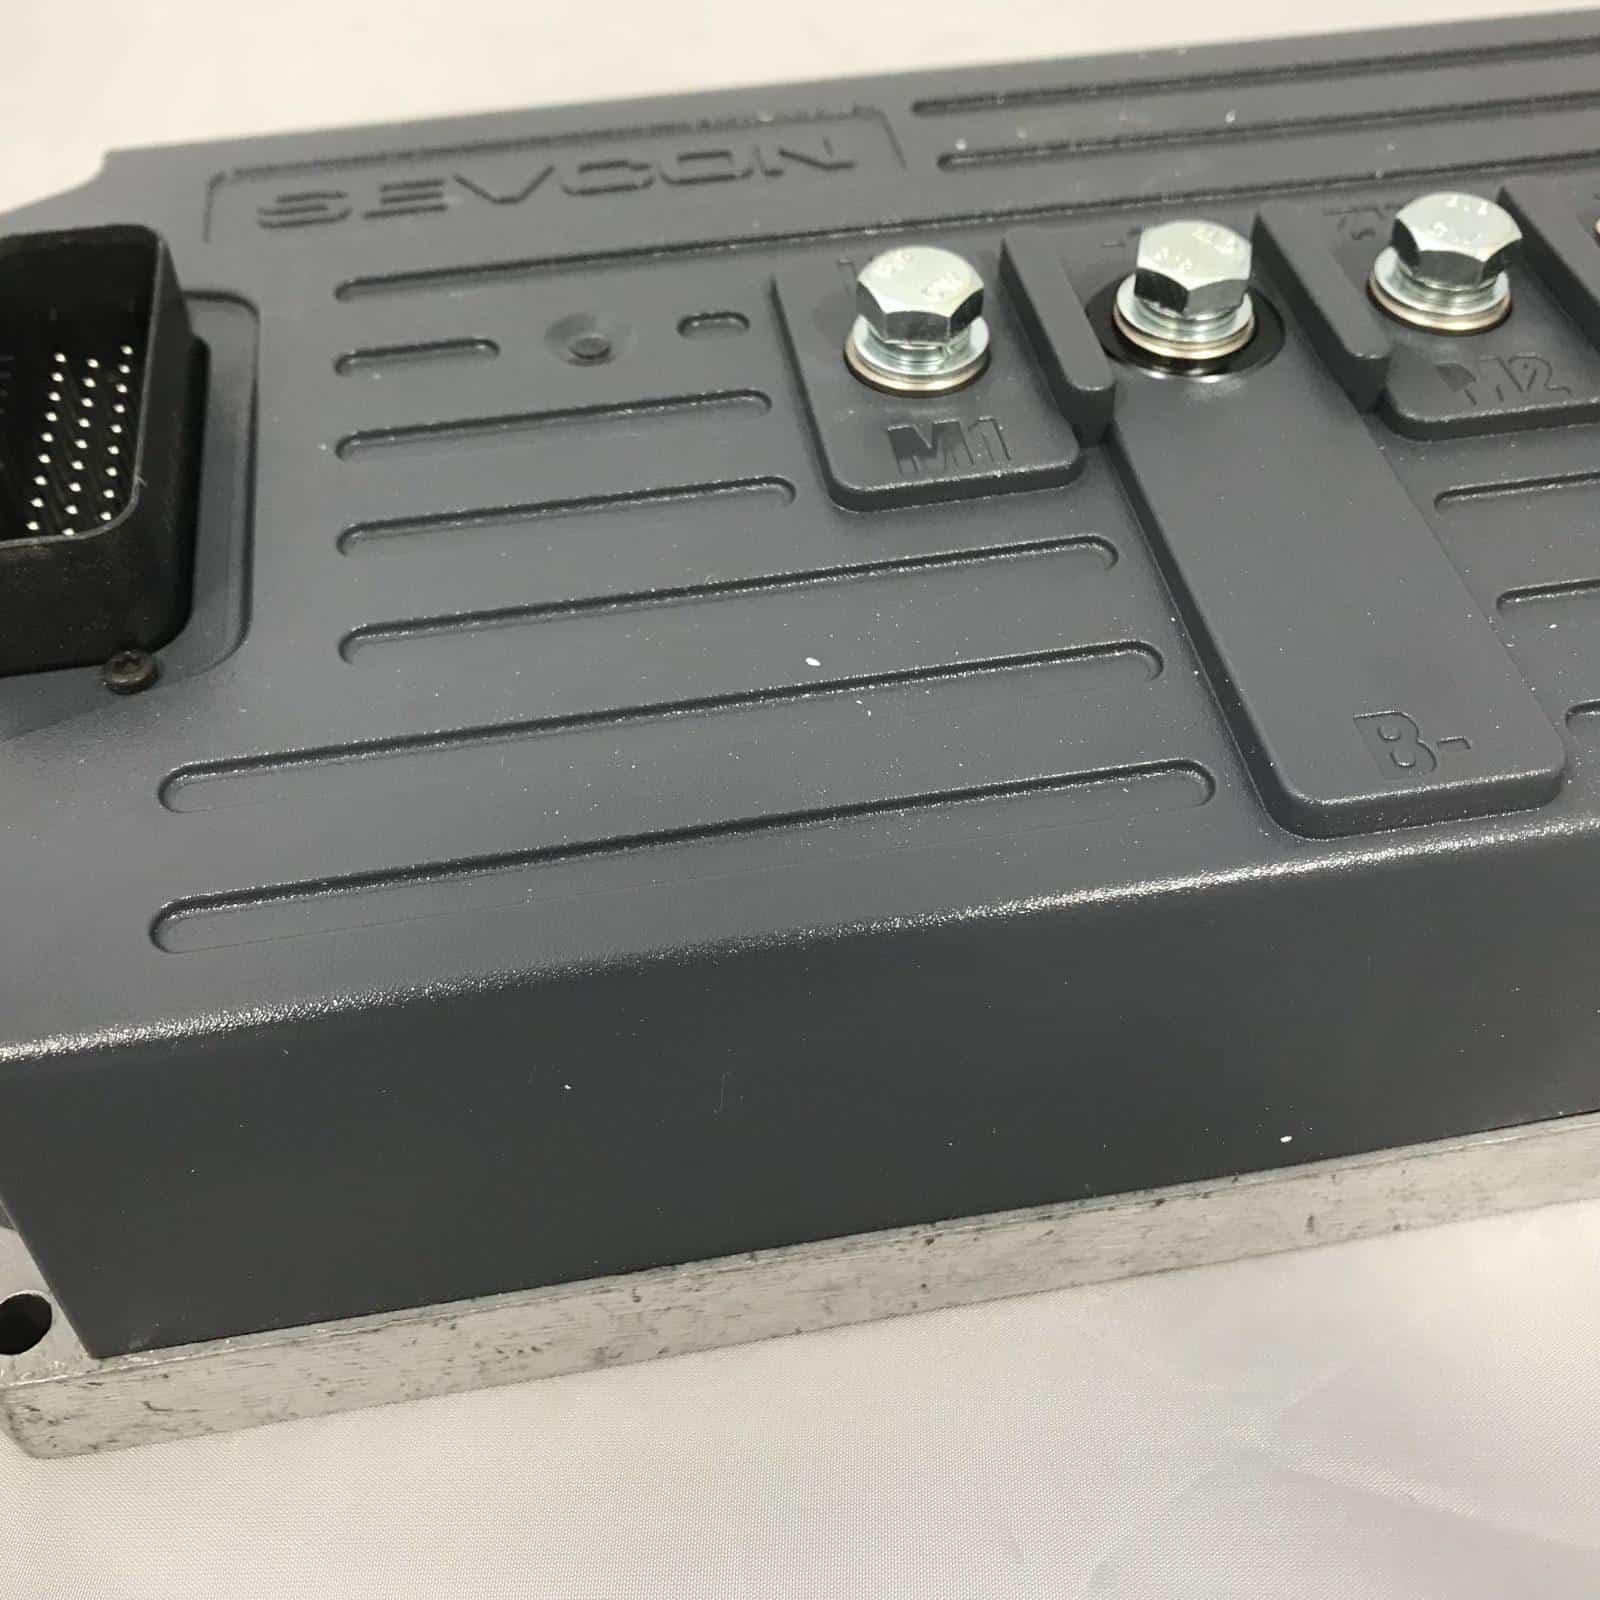 Sevcon size 6 - GEN4 AC max 80V - 550 Amp